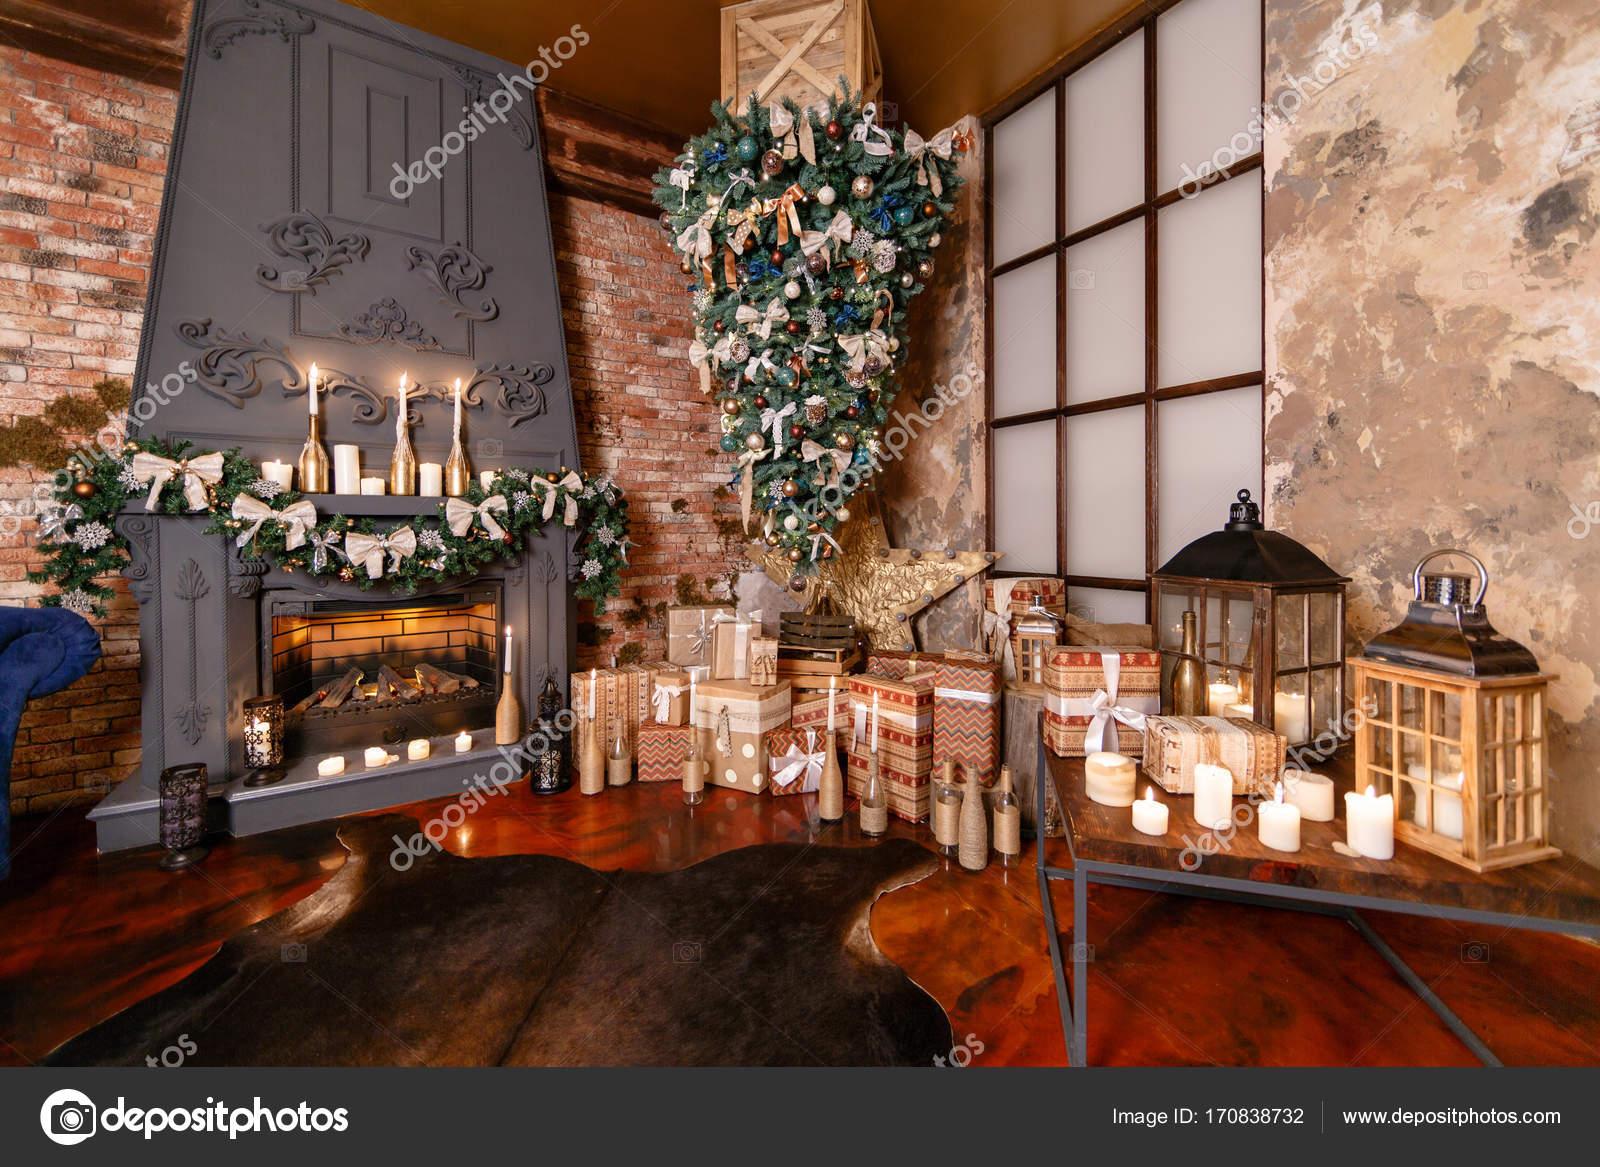 Alternative Baum kopfüber an der Decke. Winter-Wohnkultur ...